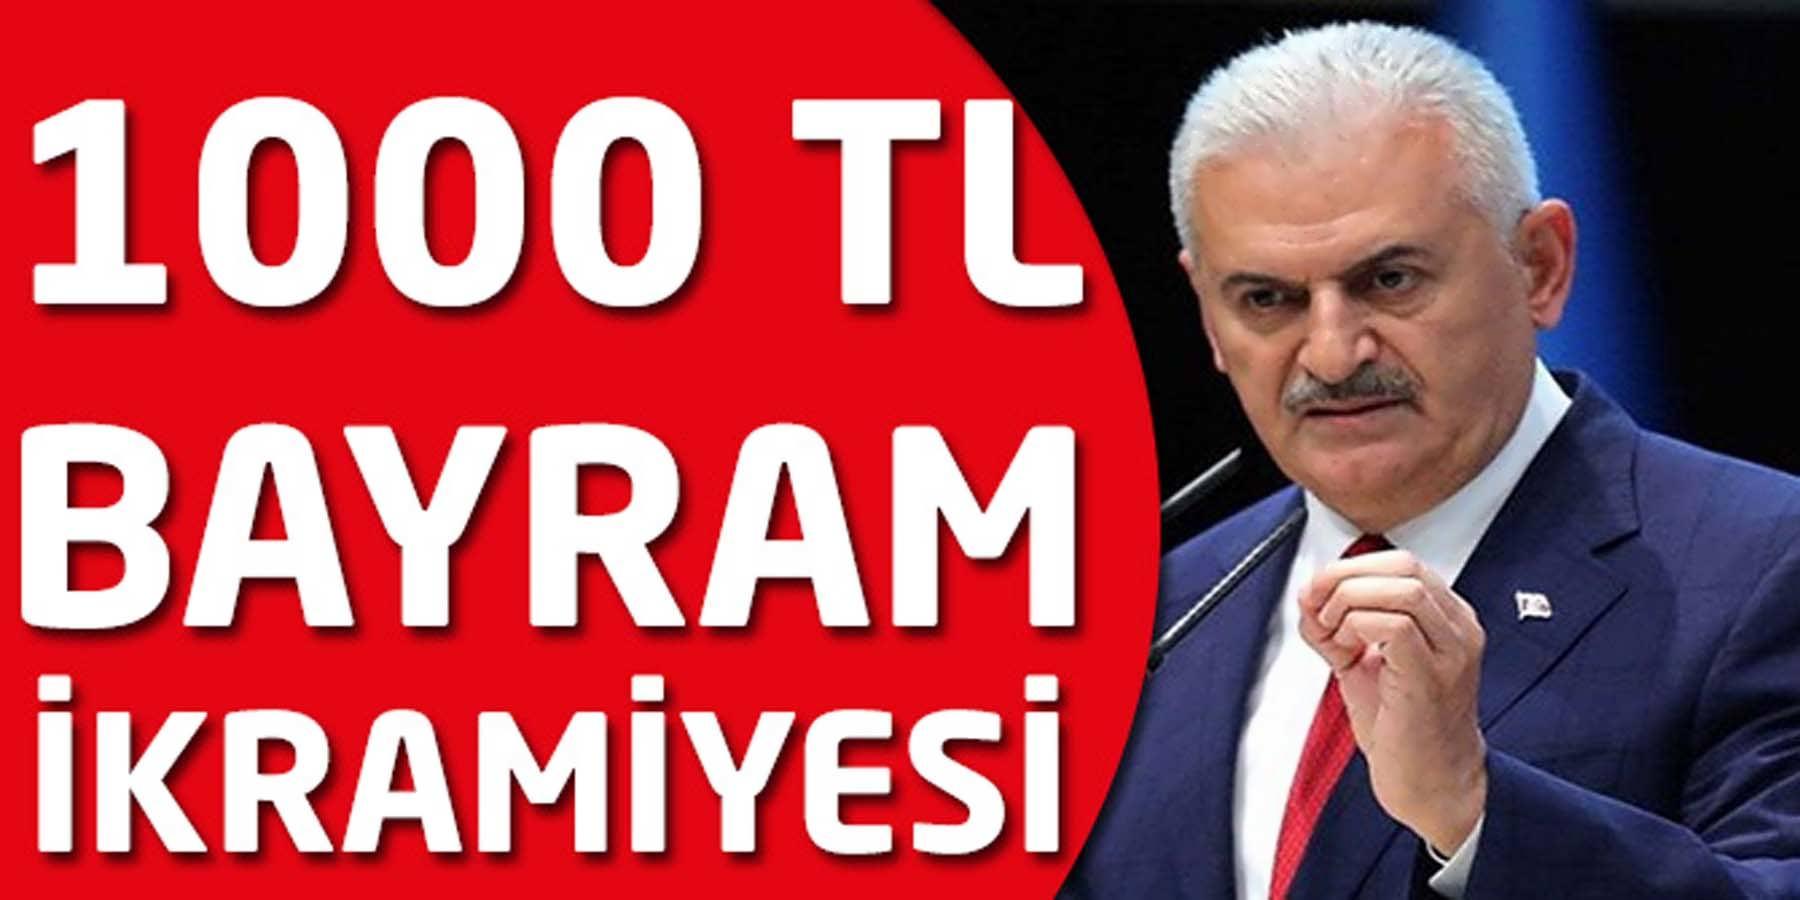 Başbakandan 1000 TL Bayram İkramiyesi Müjdesi